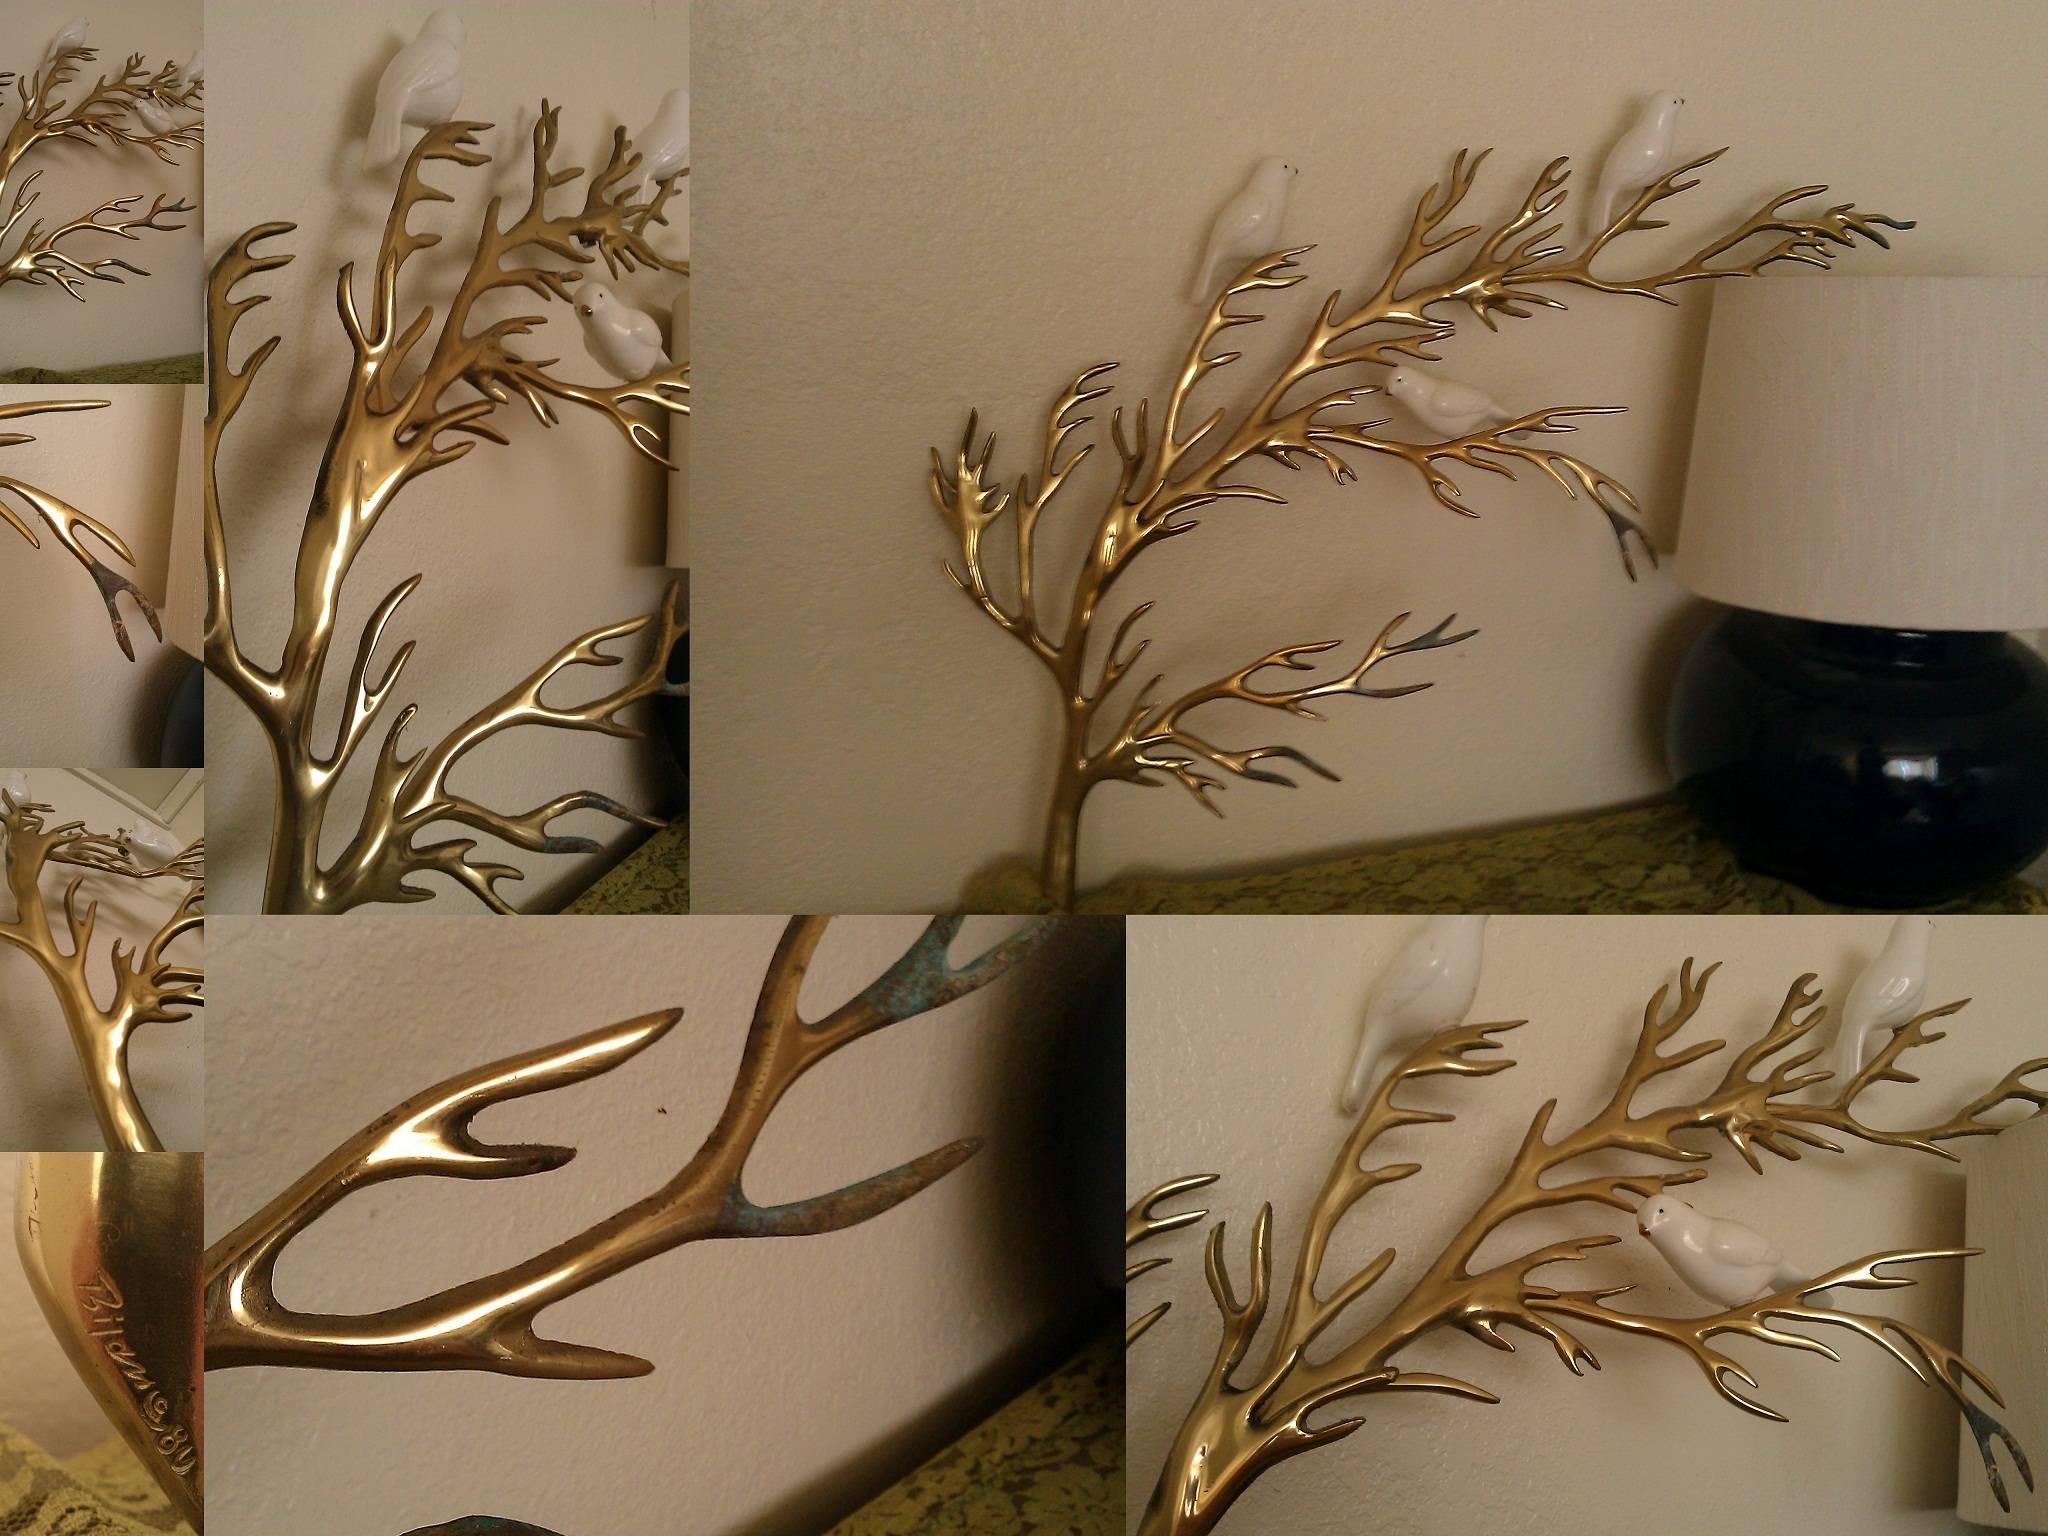 Wall Art Designs: Wall Art Sculpture Rare Vintage Bijan Brass Tree Pertaining To Most Popular Tree Sculpture Wall Art (View 9 of 20)